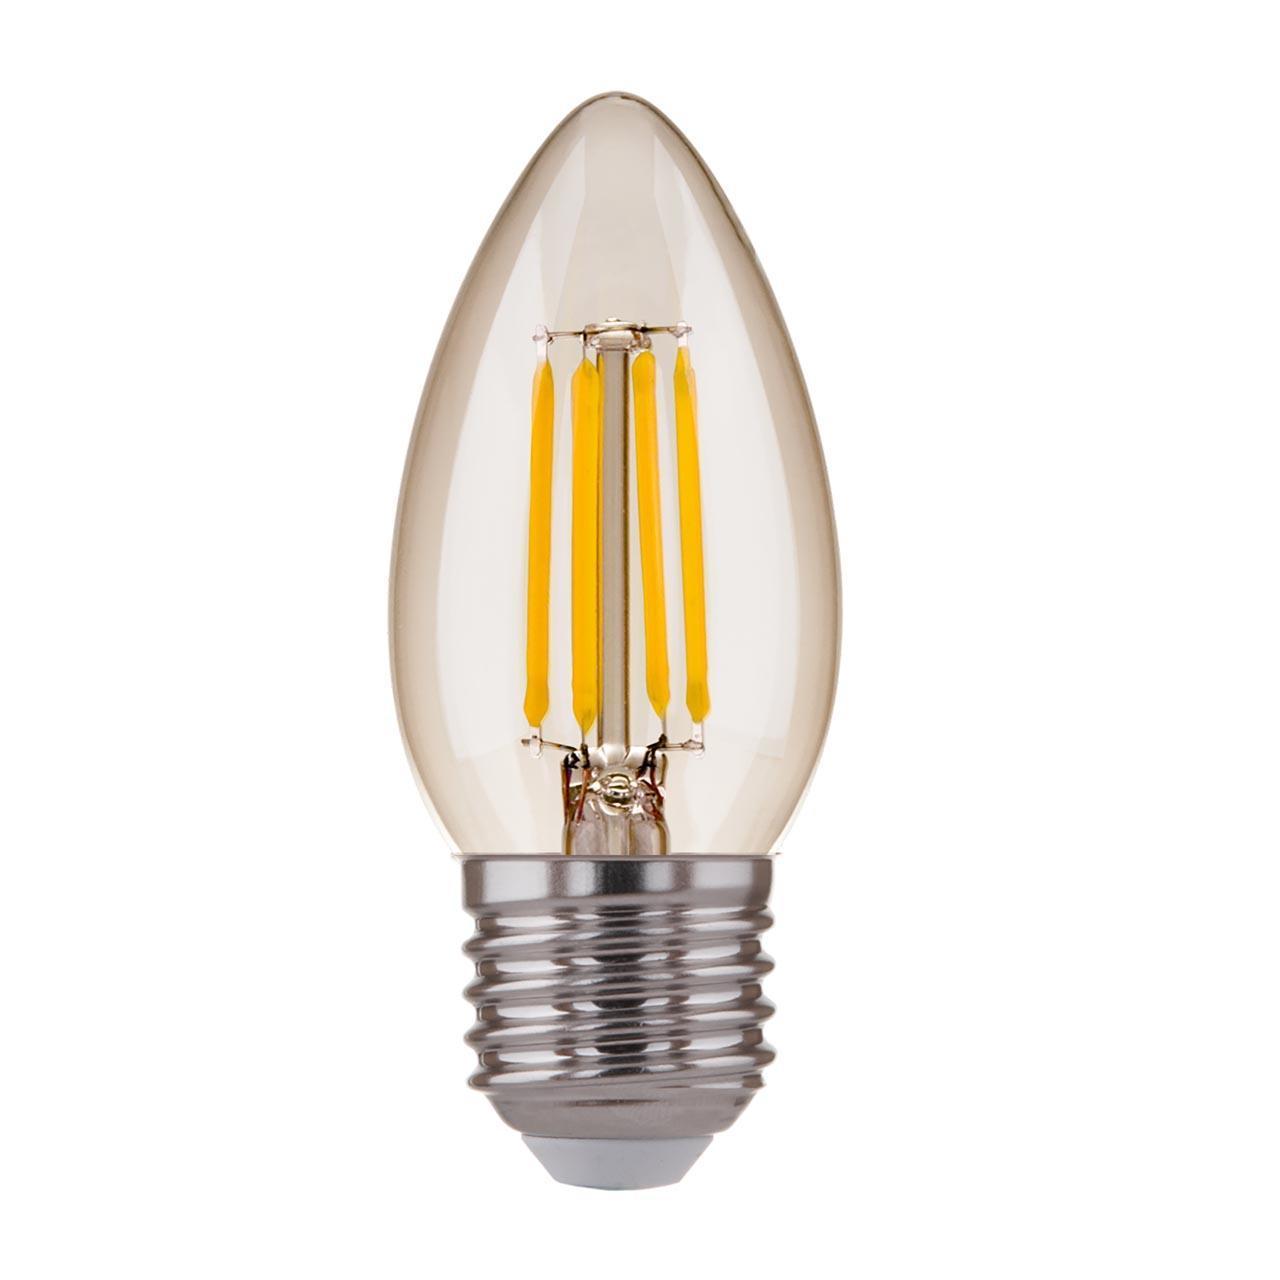 Лампа светодиодная филаментная E27 7W 3300K прозрачная 4690389125256 elektrostandard лампа светодиодная e14 7w 3300k шар матовый mini 4690389061622